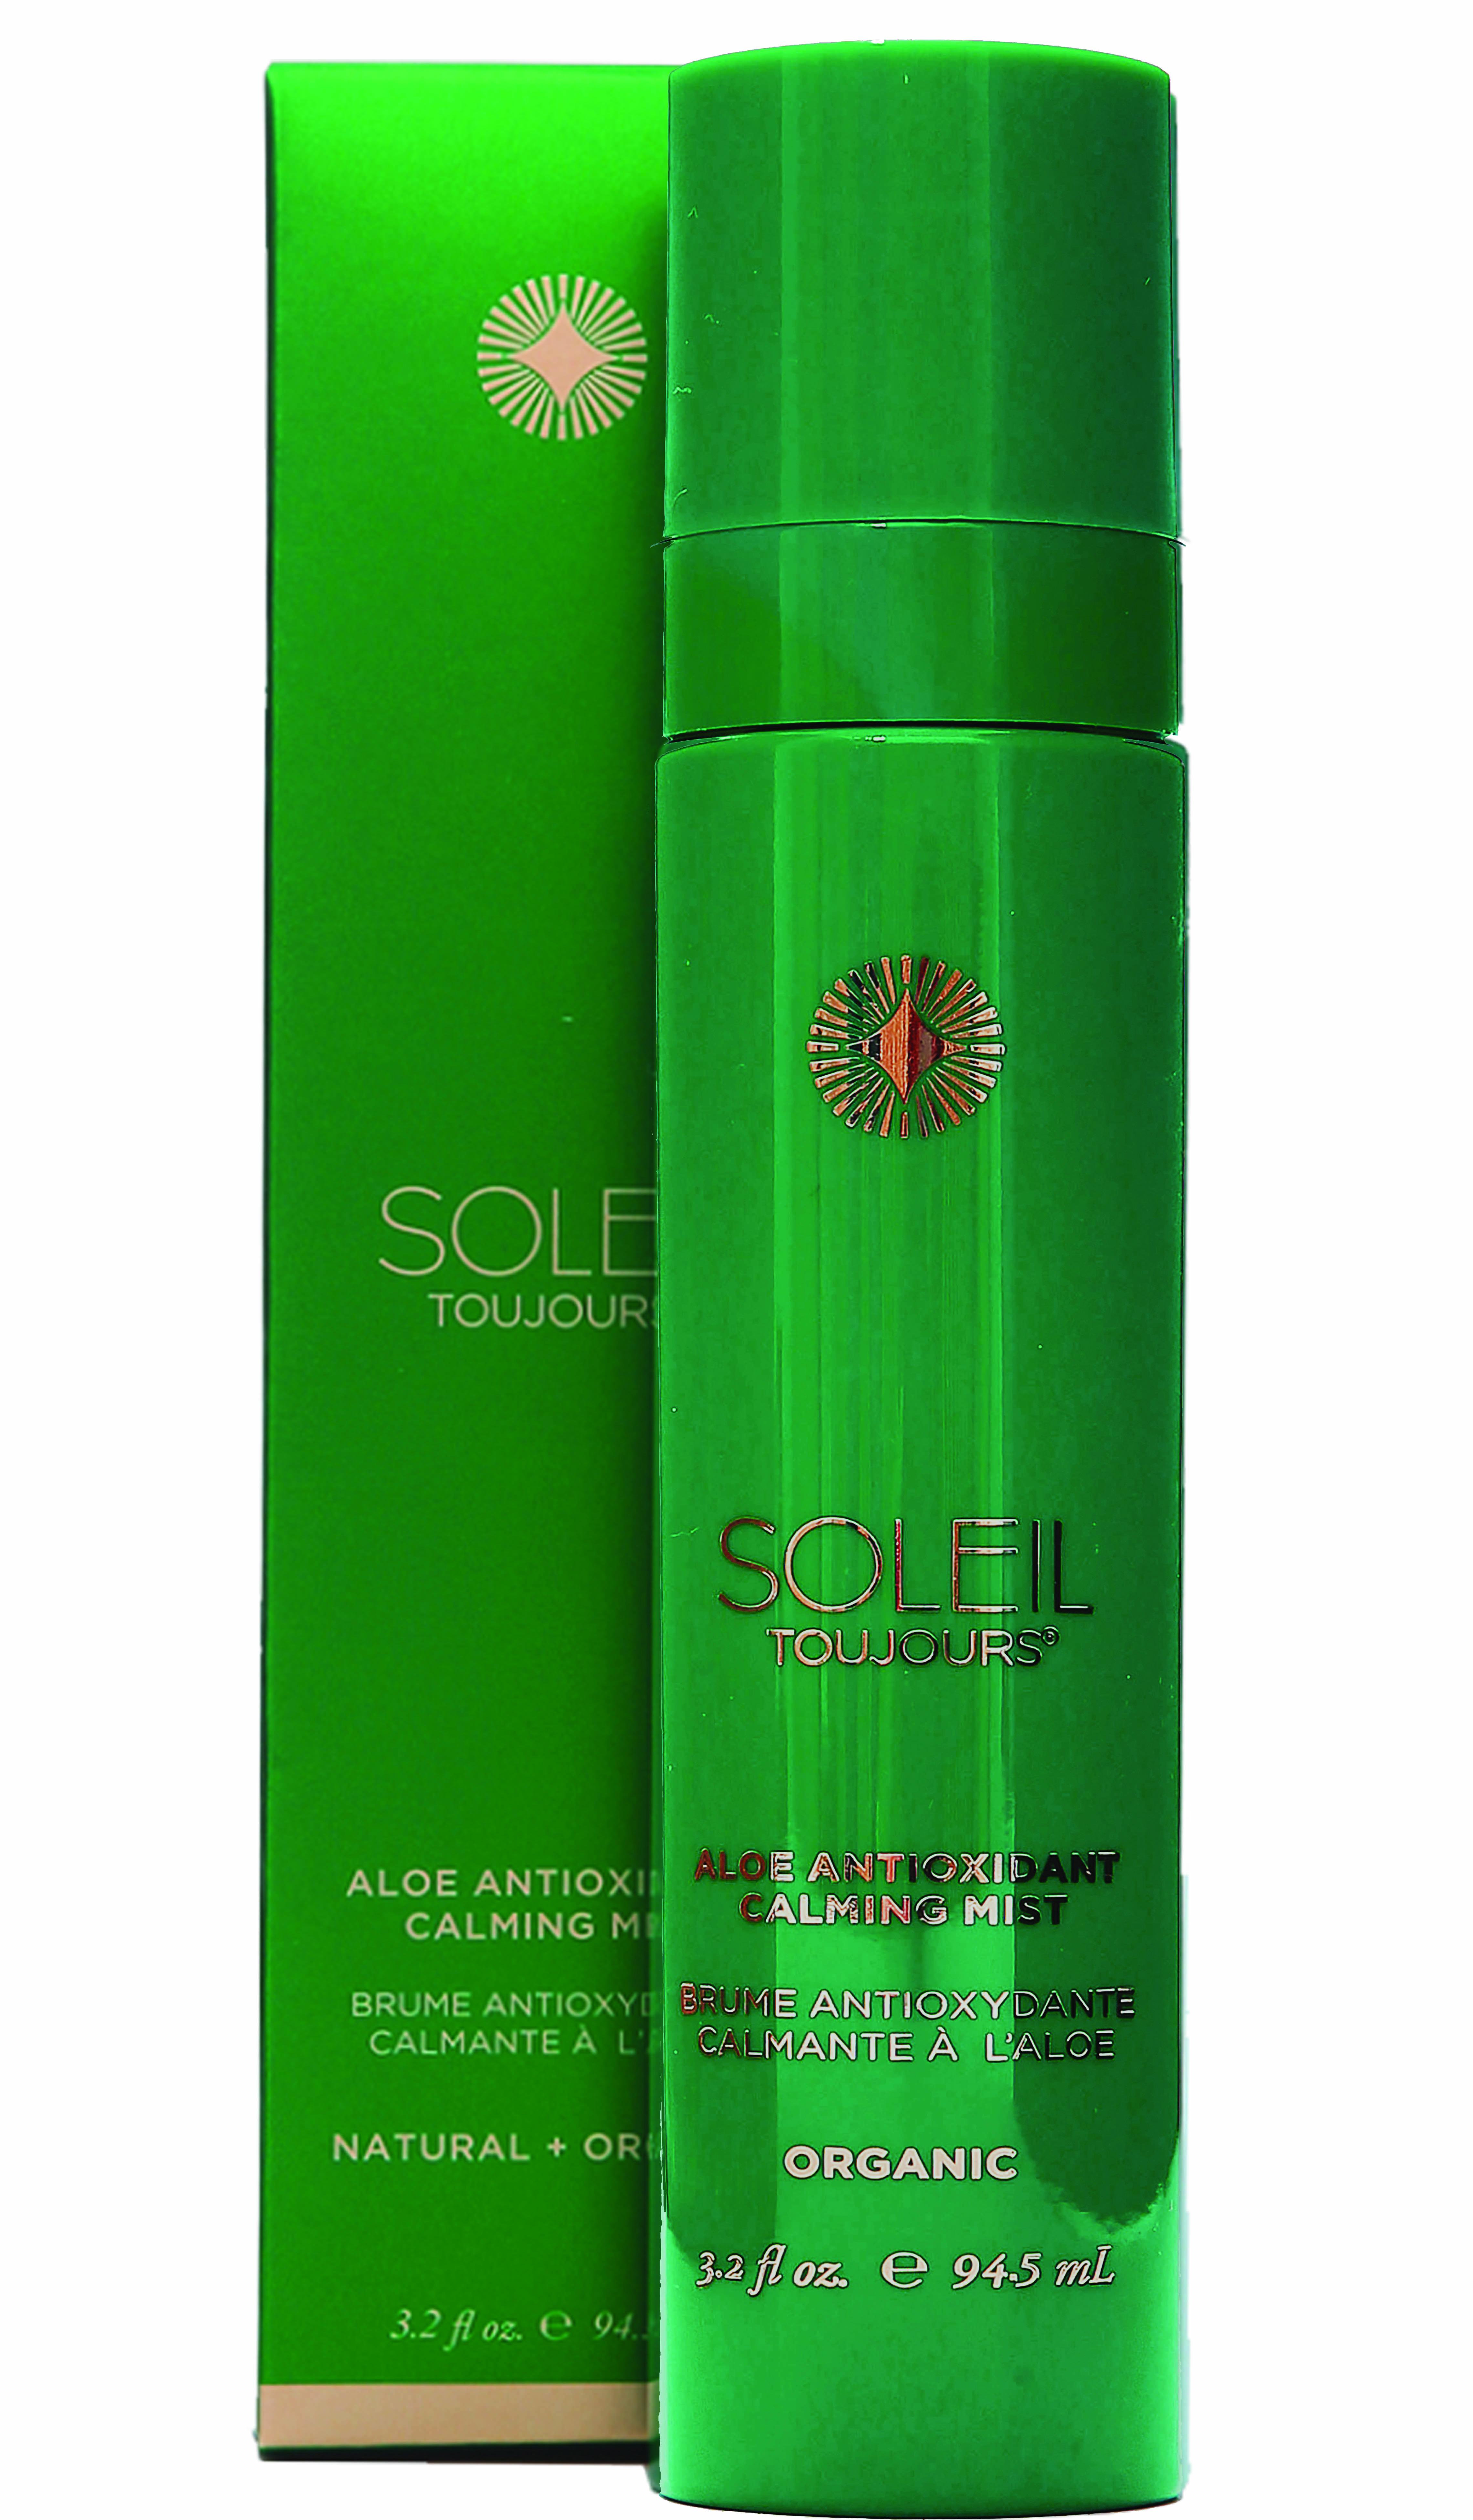 Beach Getaway Essentials Soleil Toujours Organic Aloe Antioxidant Calming Mist